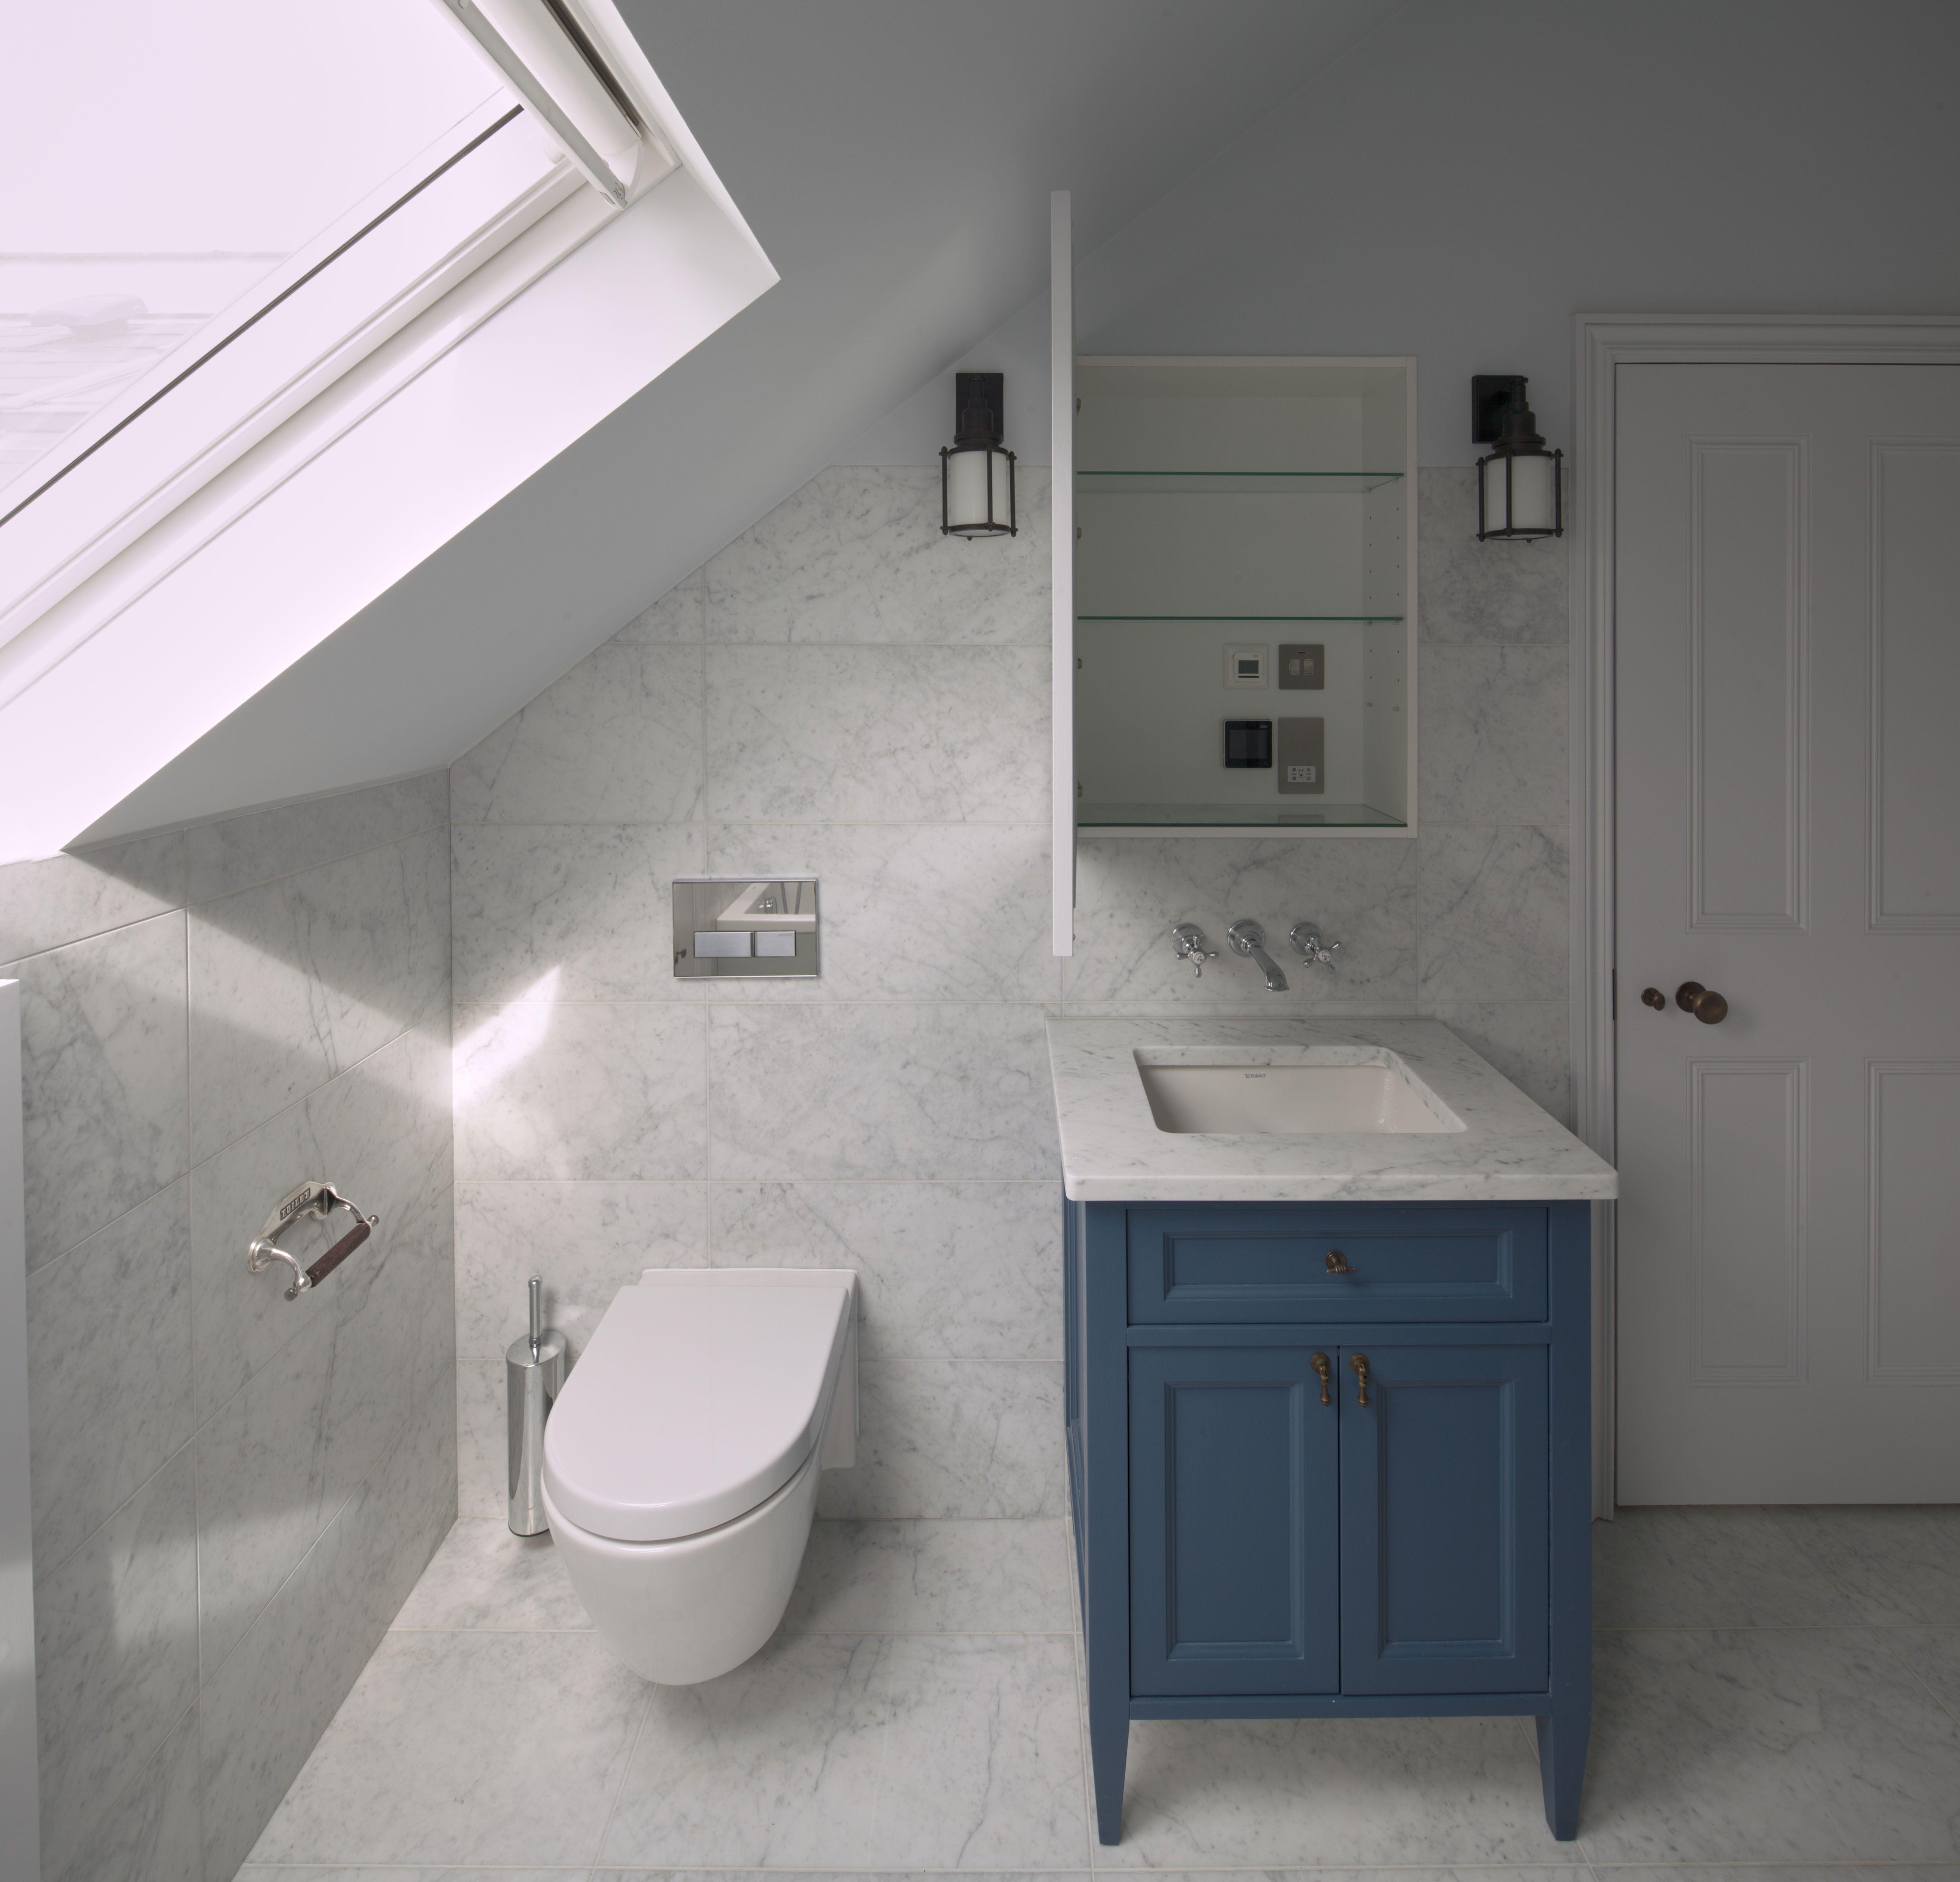 Quality vanity units bathroom - Bathroom Bespoke Bathroom Vanity Unit